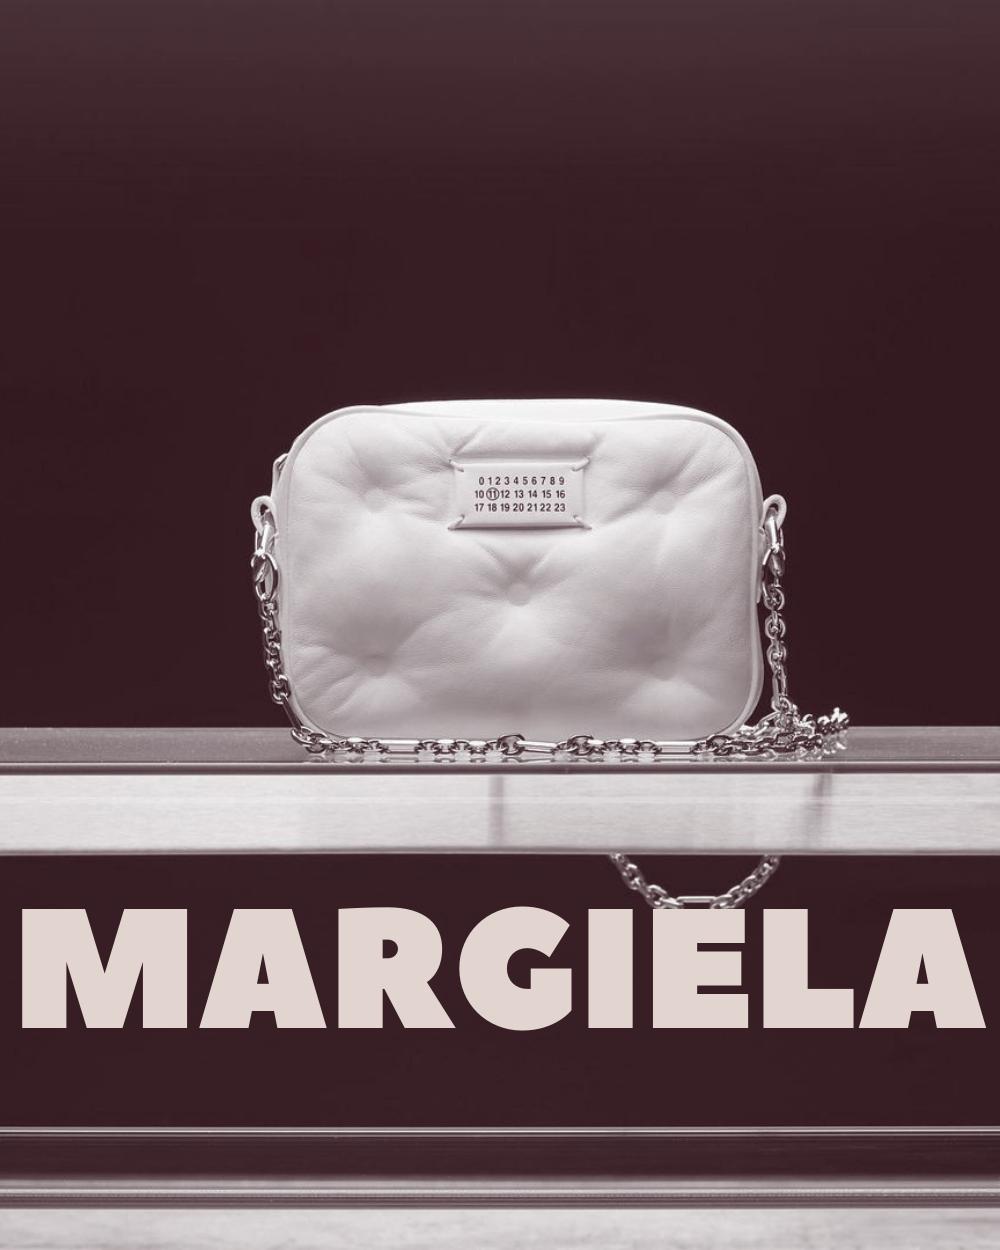 MARGIELA An artisanal affair